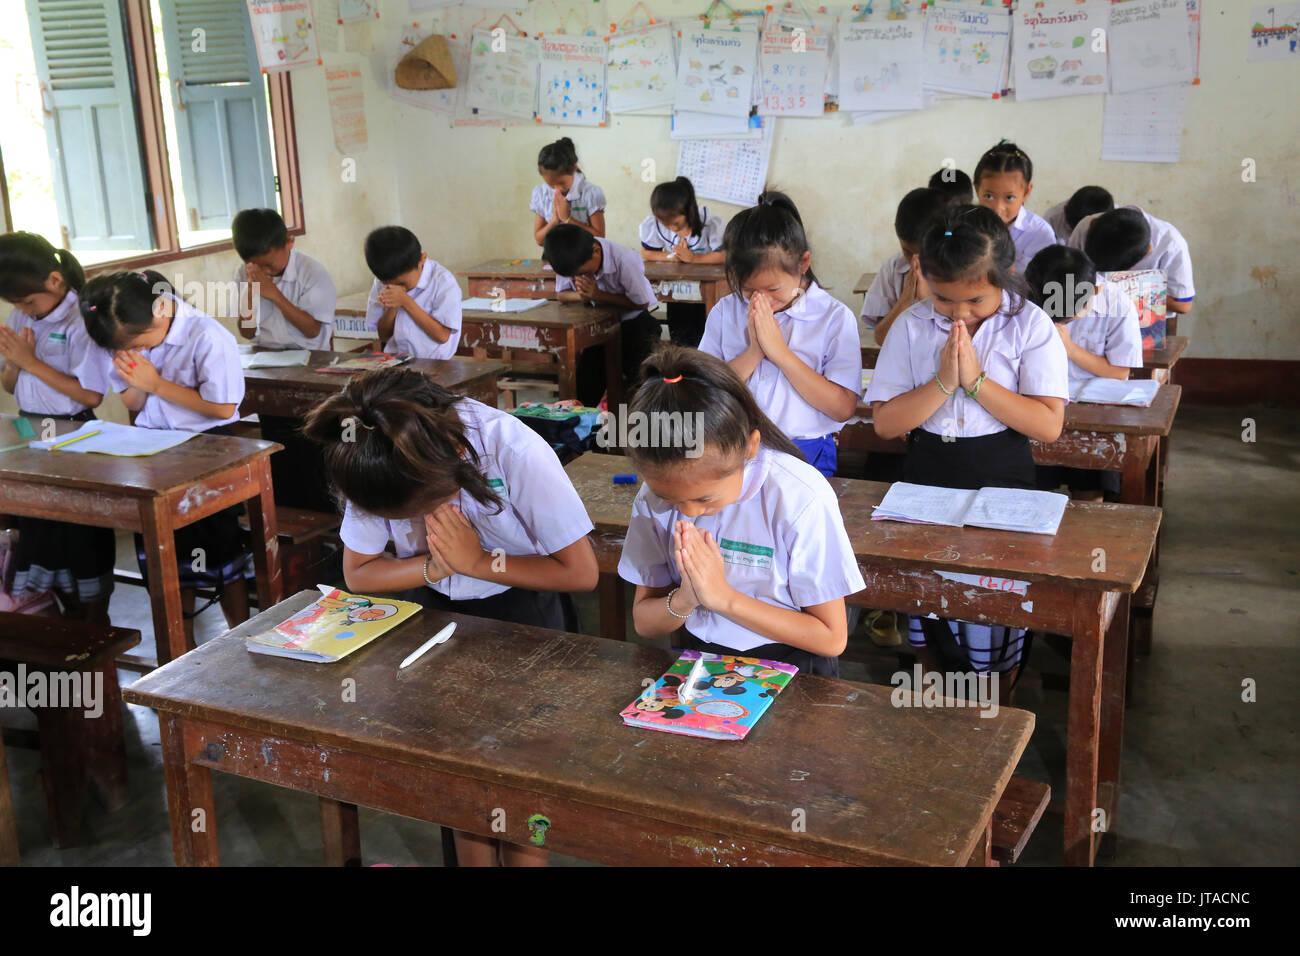 Schoolchildren in classroom, Elementary School, Vieng Vang, Laos, Indochina, Southeast Asia, Asia - Stock Image